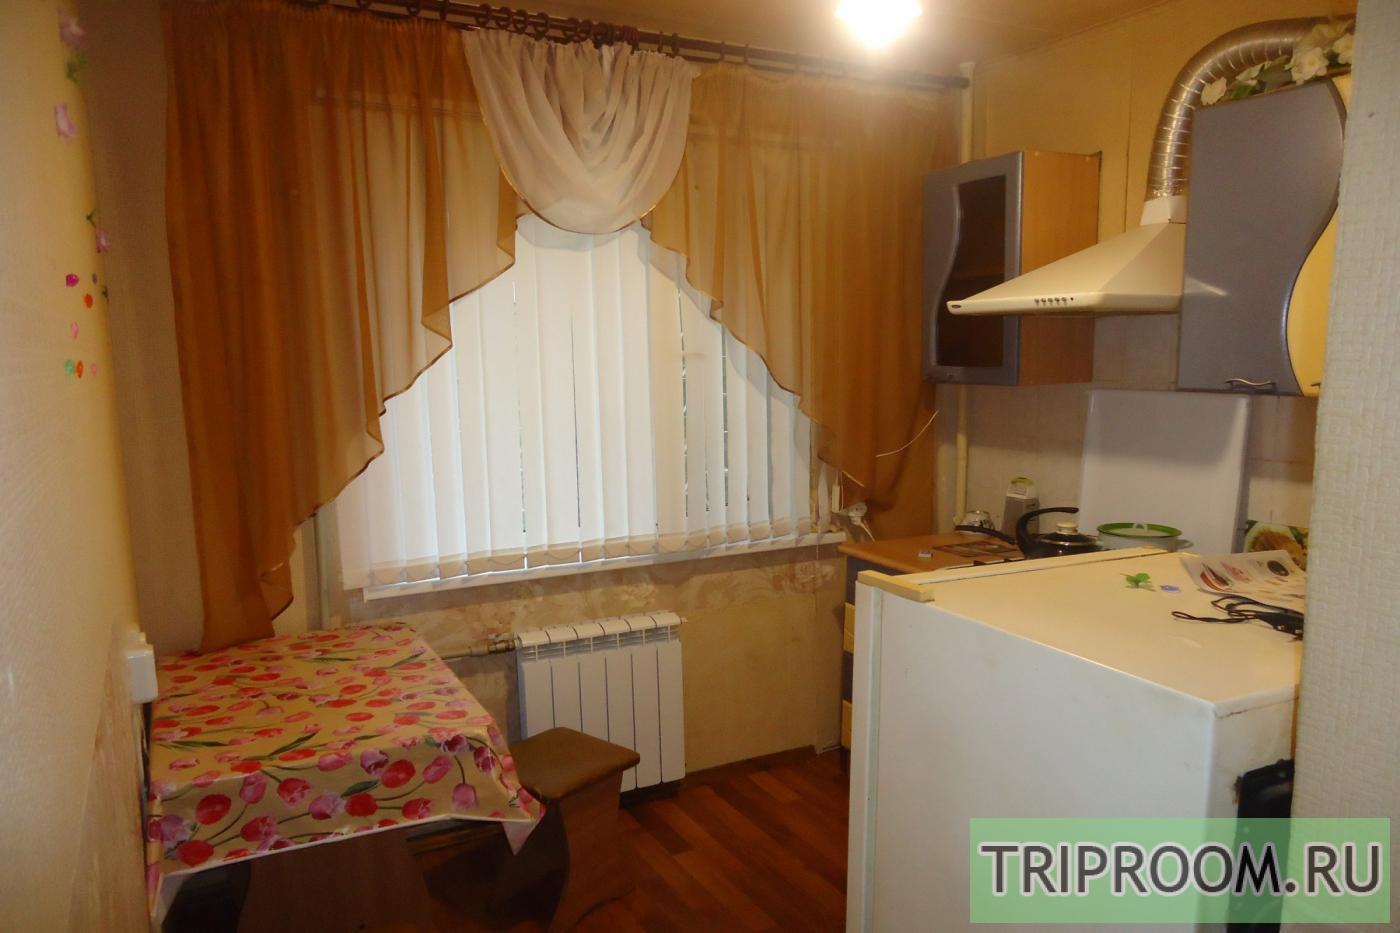 1-комнатная квартира посуточно (вариант № 21212), ул. Лебедева-Лумача улица, фото № 2